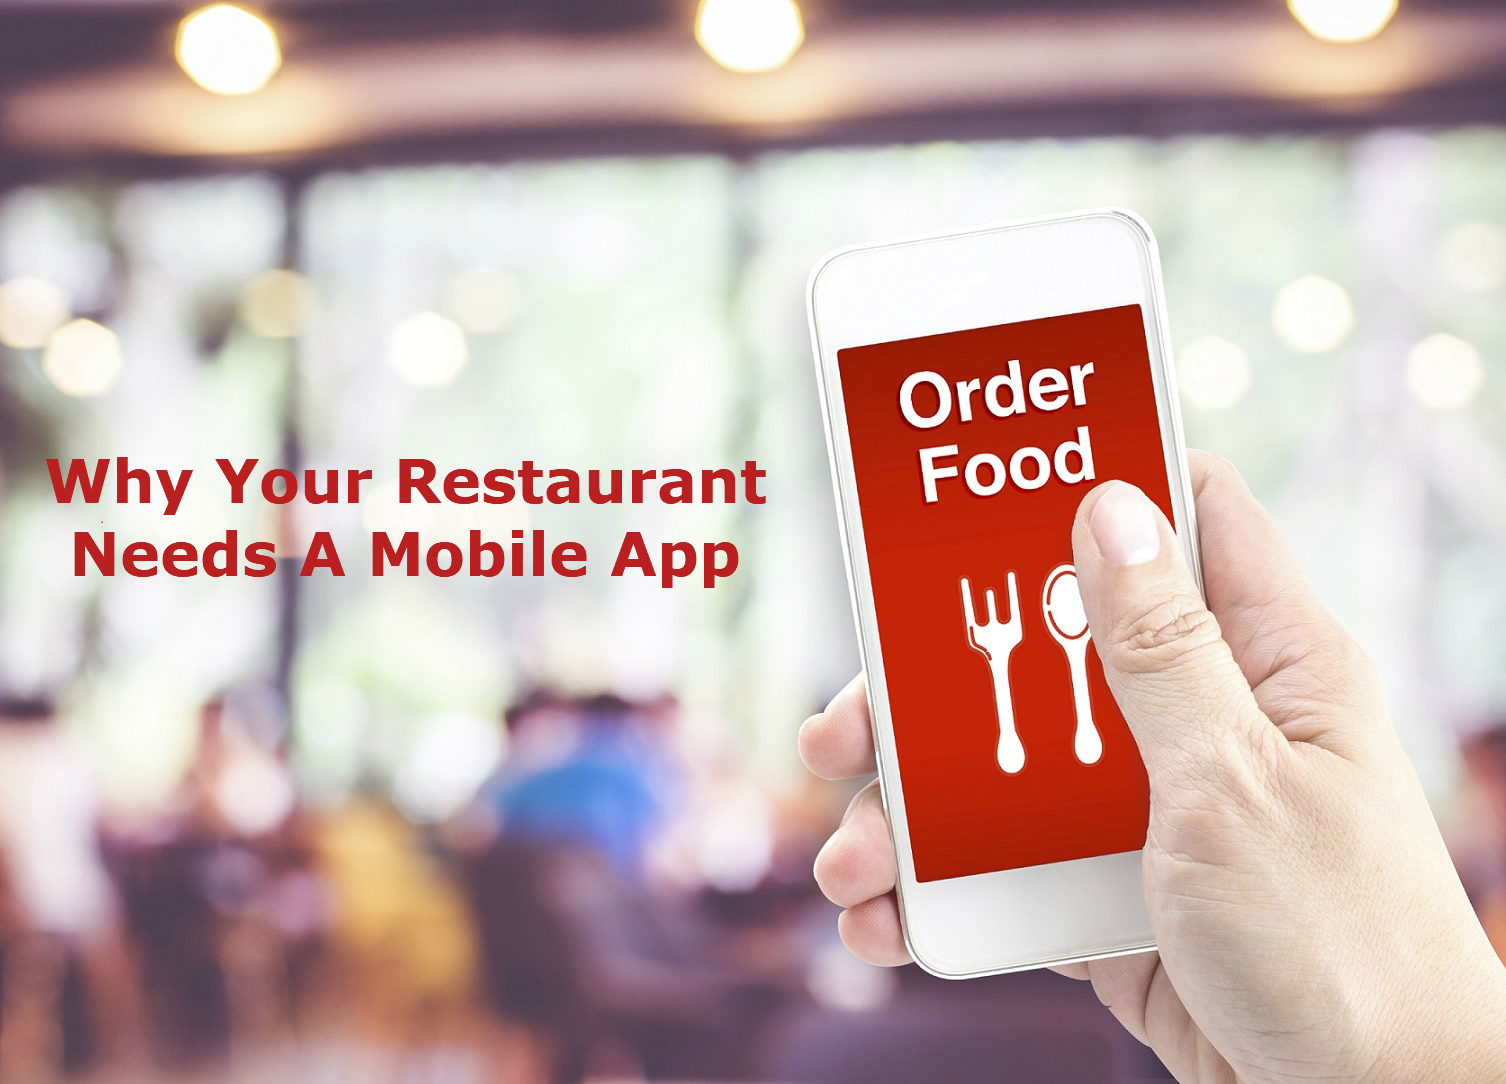 Restaurant Needs A Mobile App